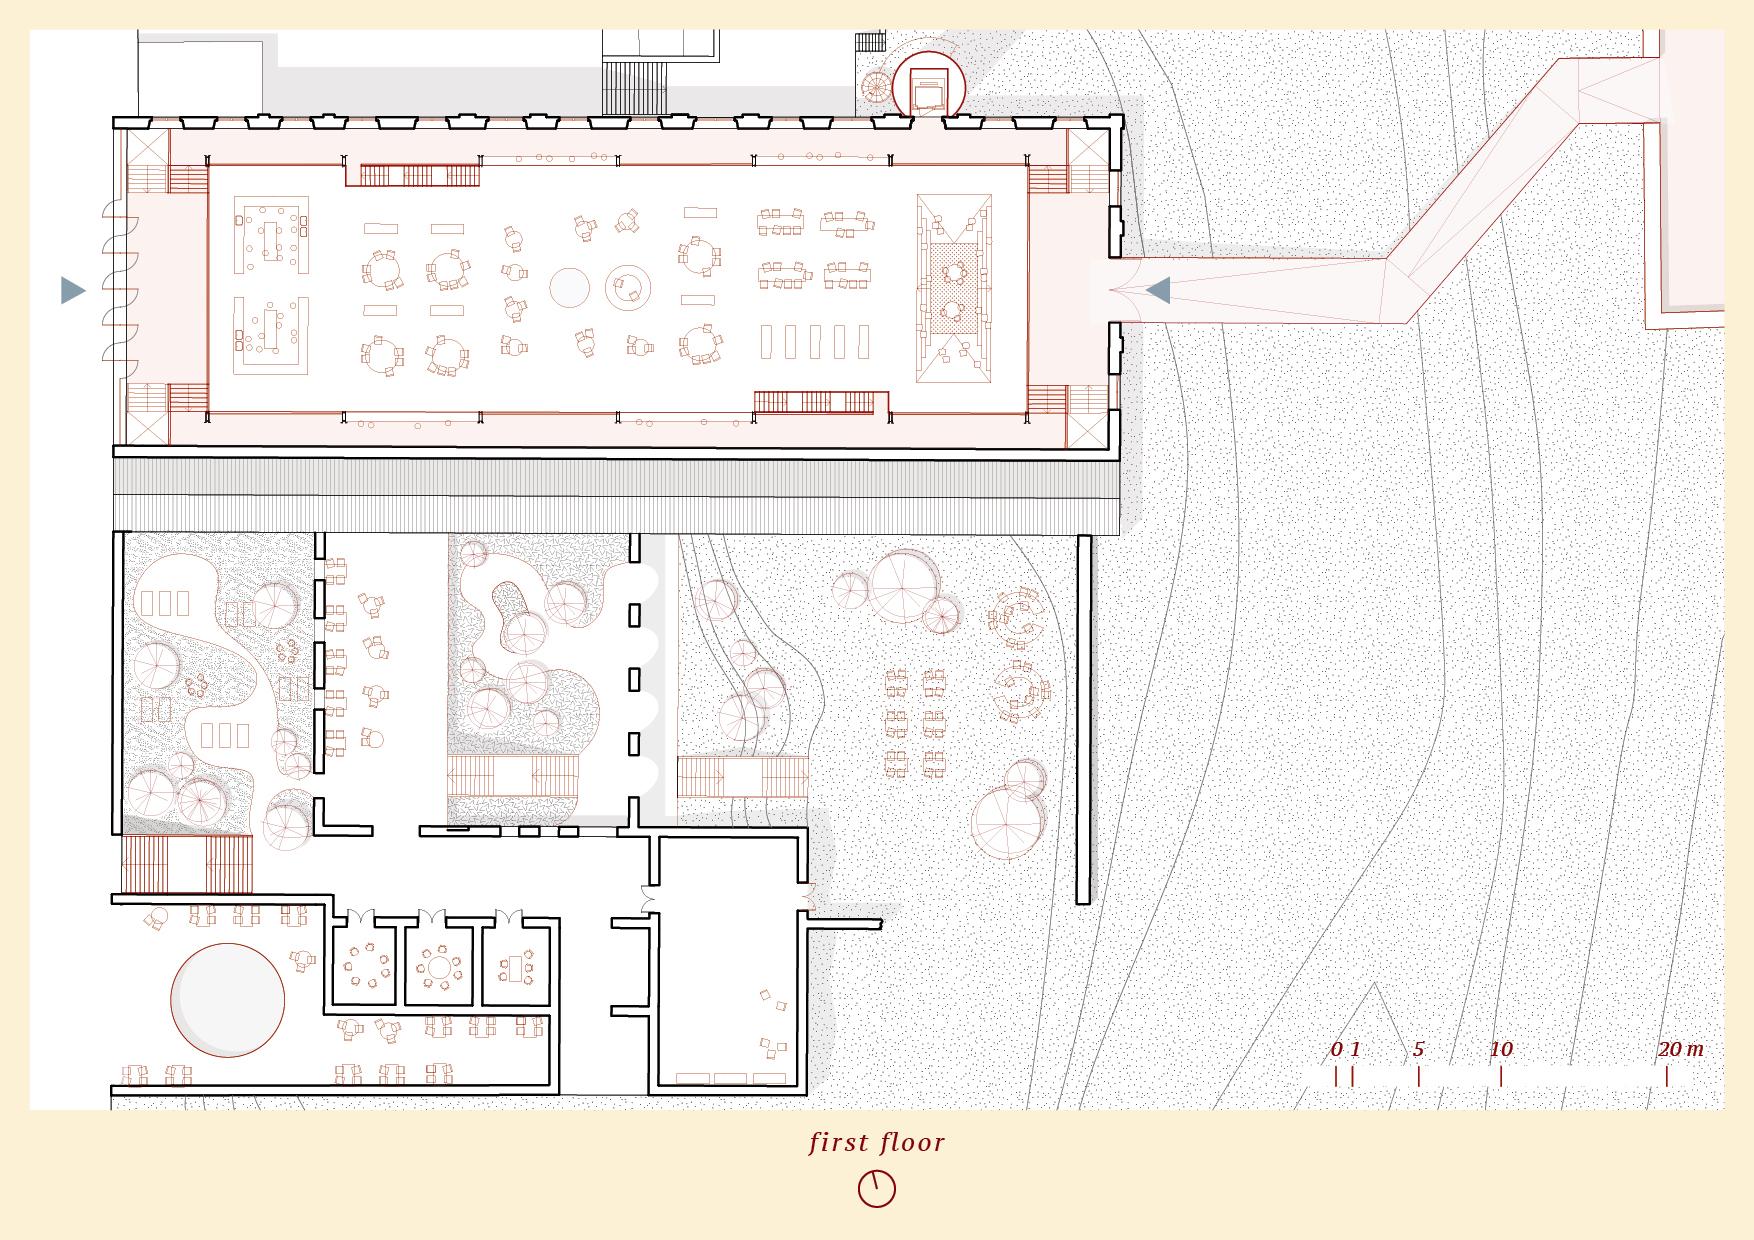 06_first_floor.jpg